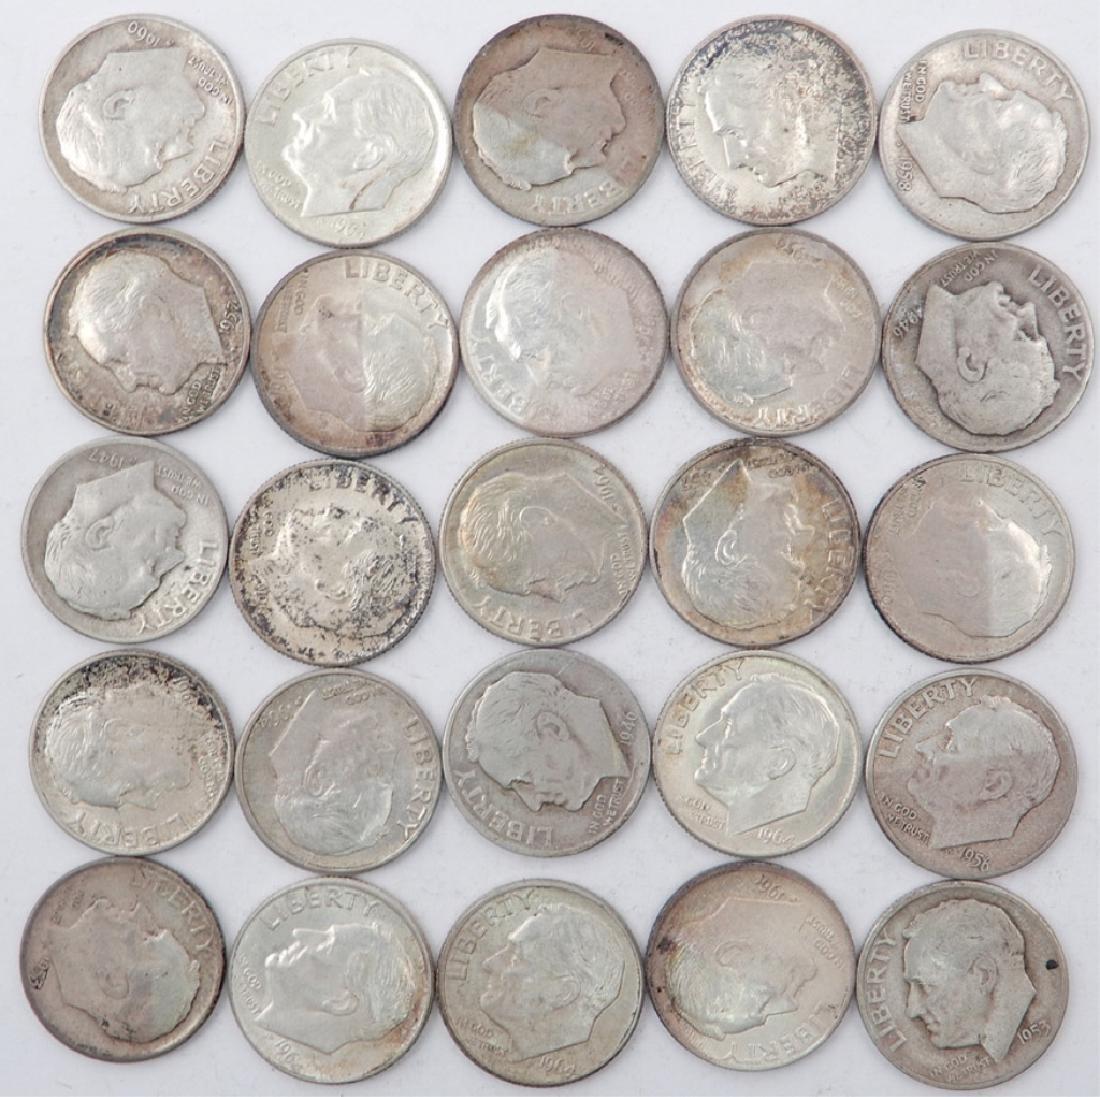 Twenty five silver Roosevelt dimes